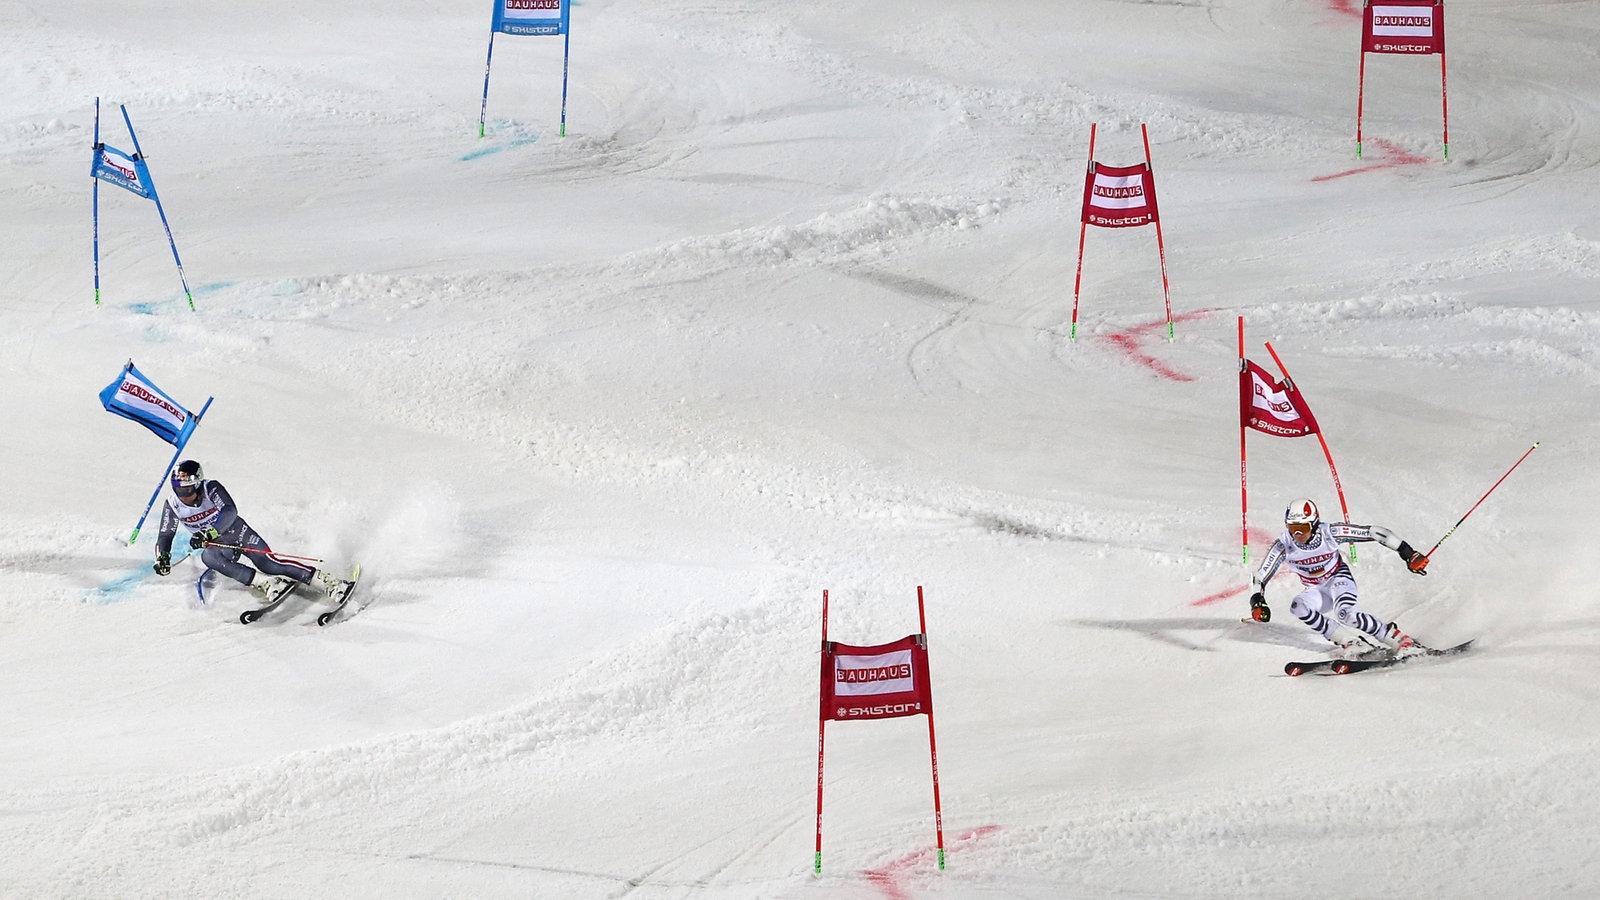 Ski Alpin Fahrer